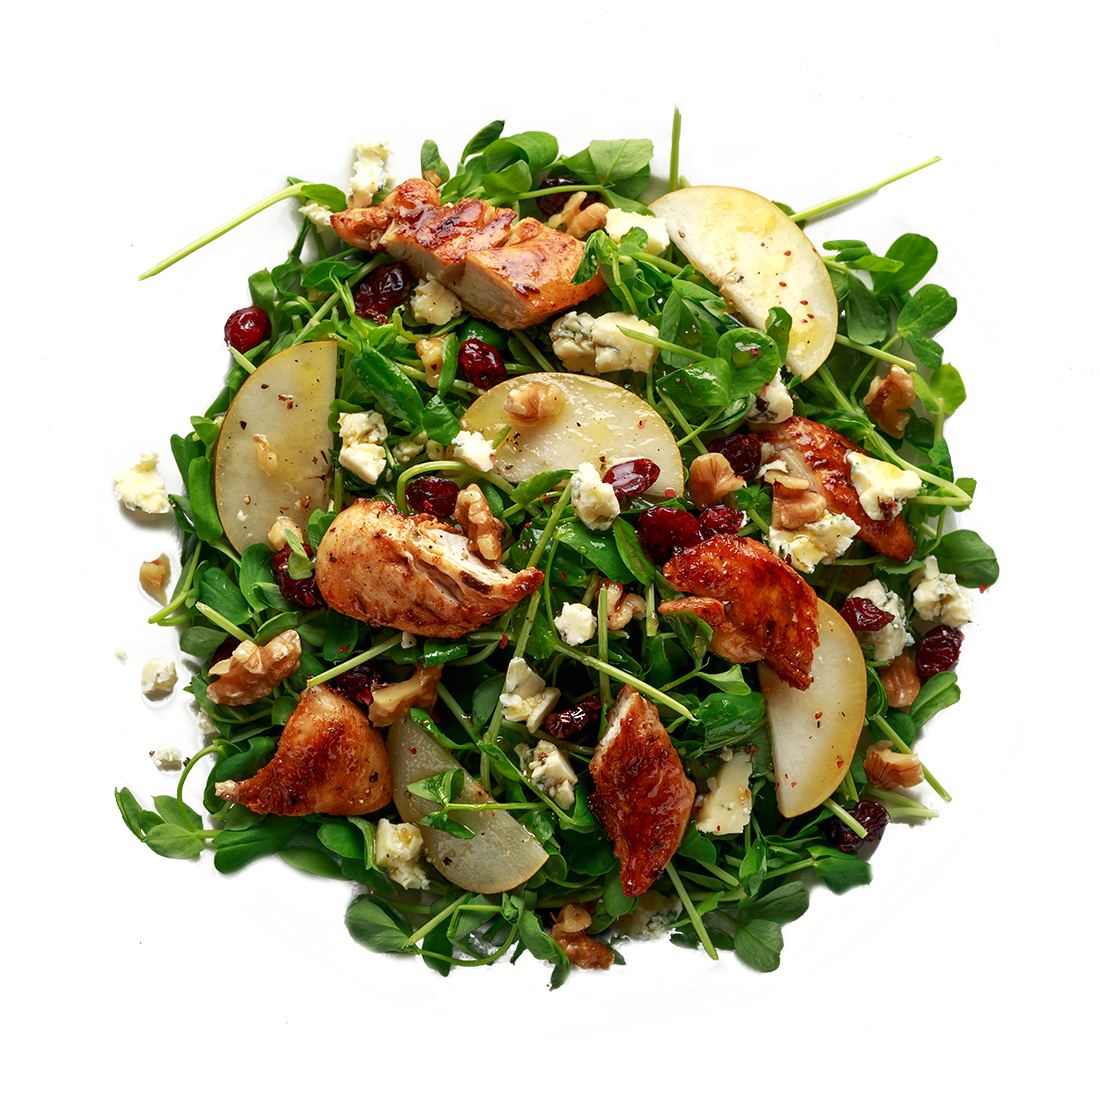 Roanoke Chicken Soul Bird Chicken Salad